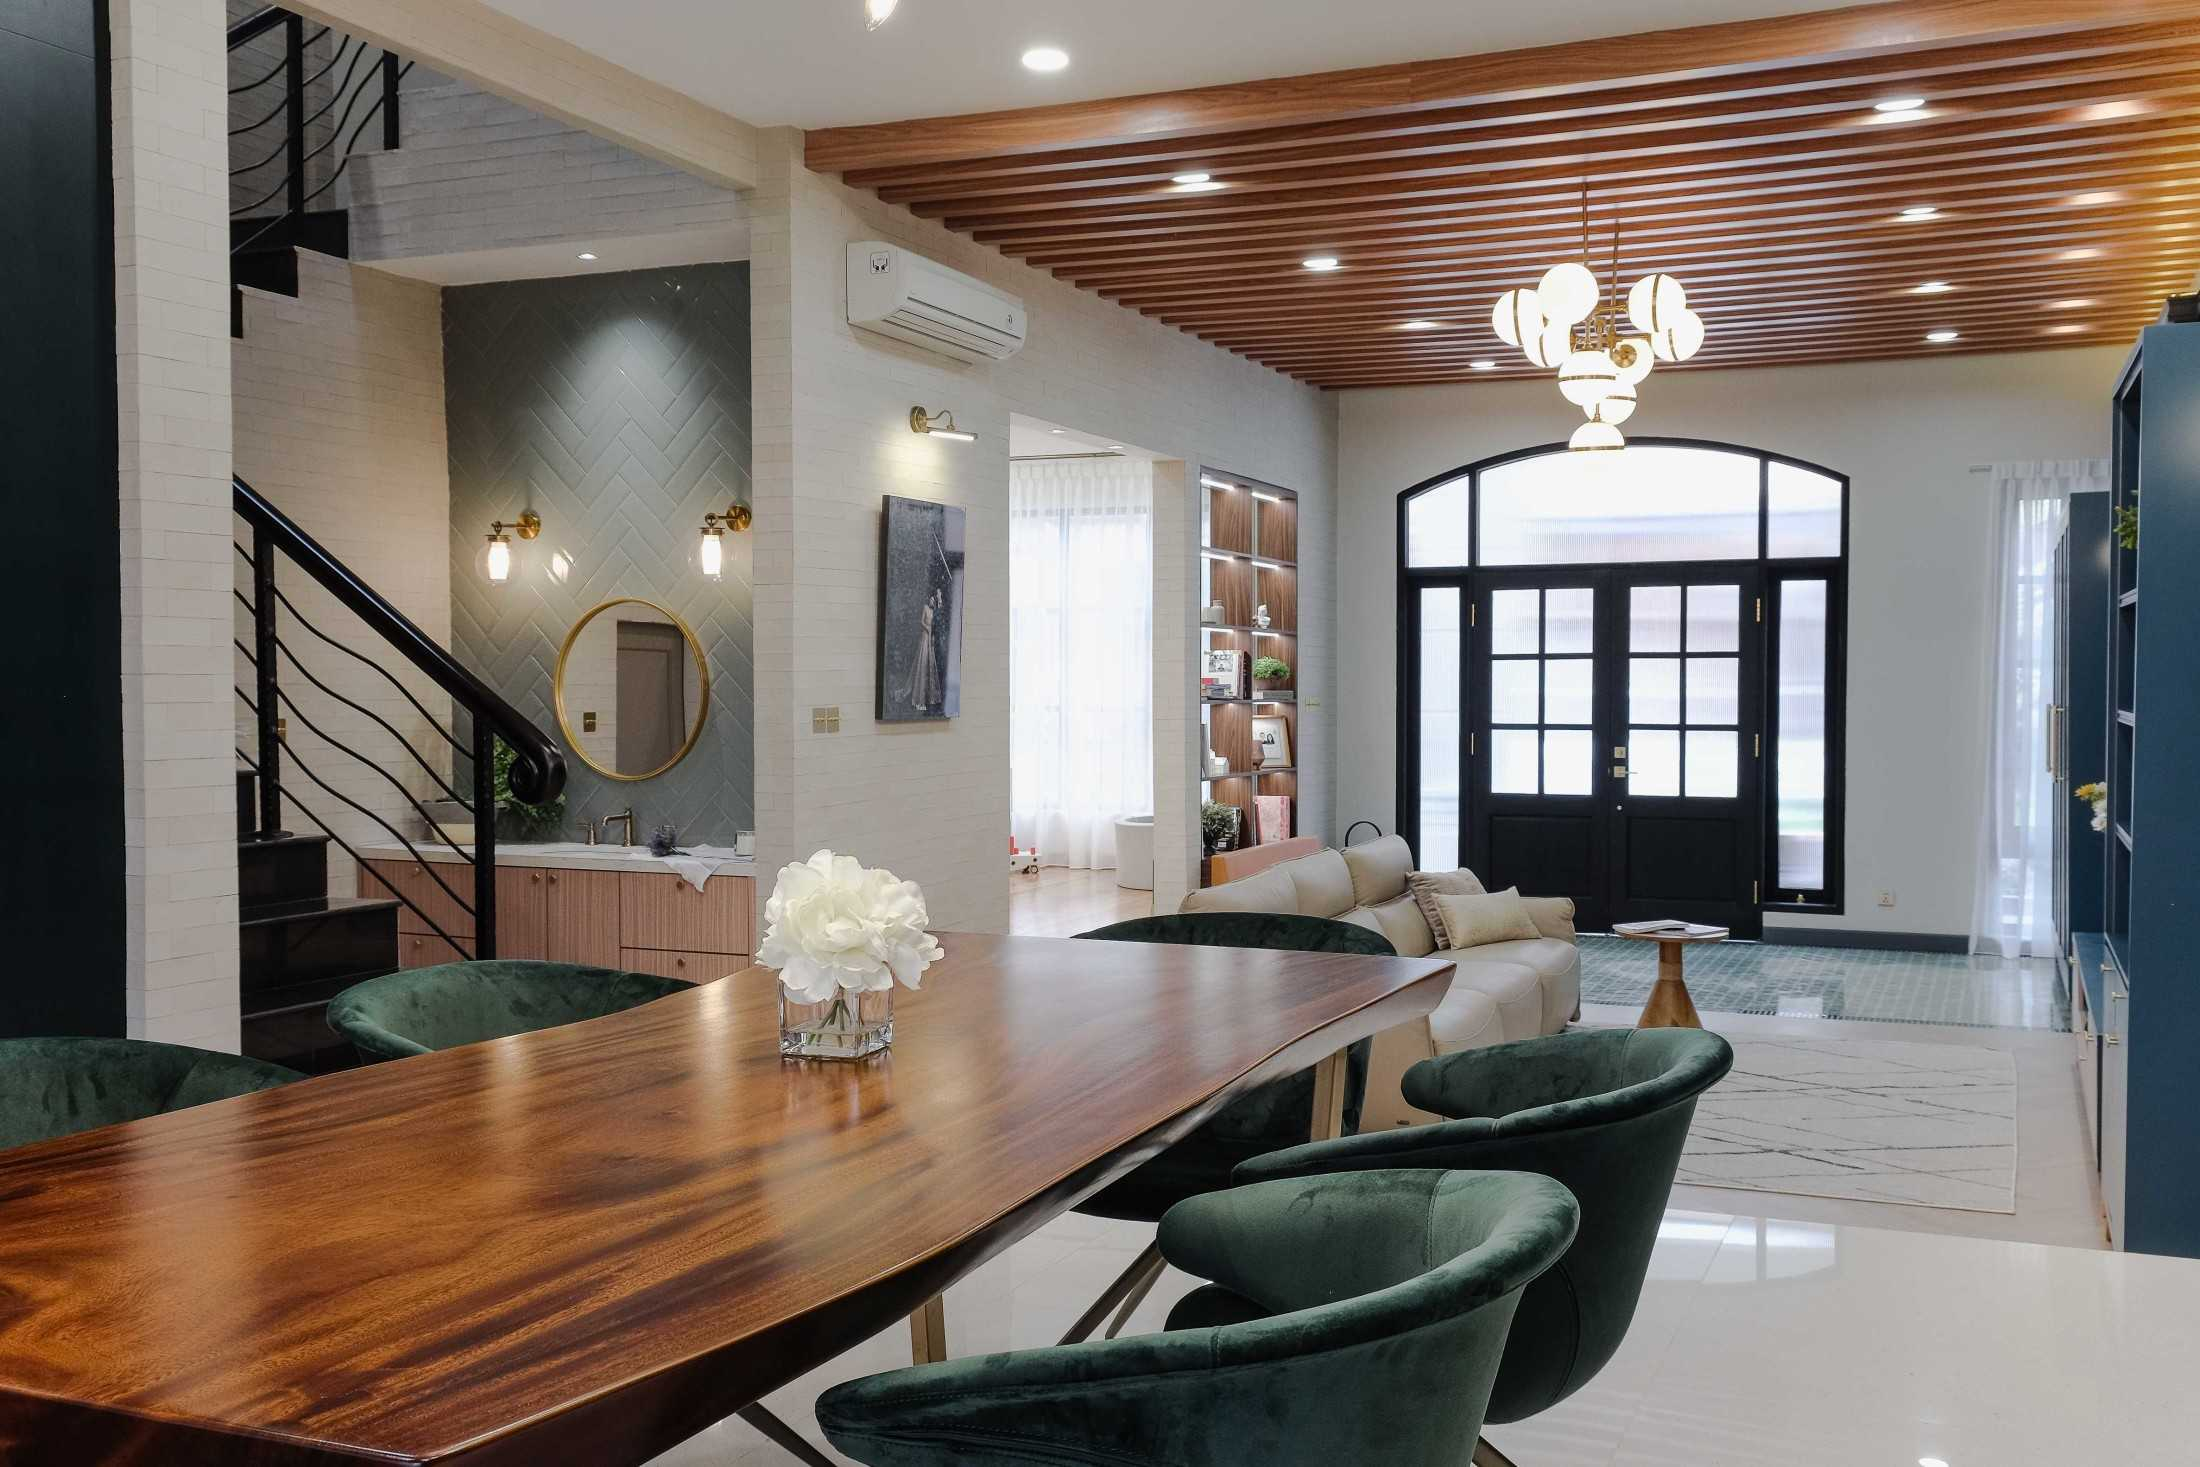 Studio Alo House H Medan, Kota Medan, Sumatera Utara, Indonesia Medan, Kota Medan, Sumatera Utara, Indonesia Ranch Style Residential  115660